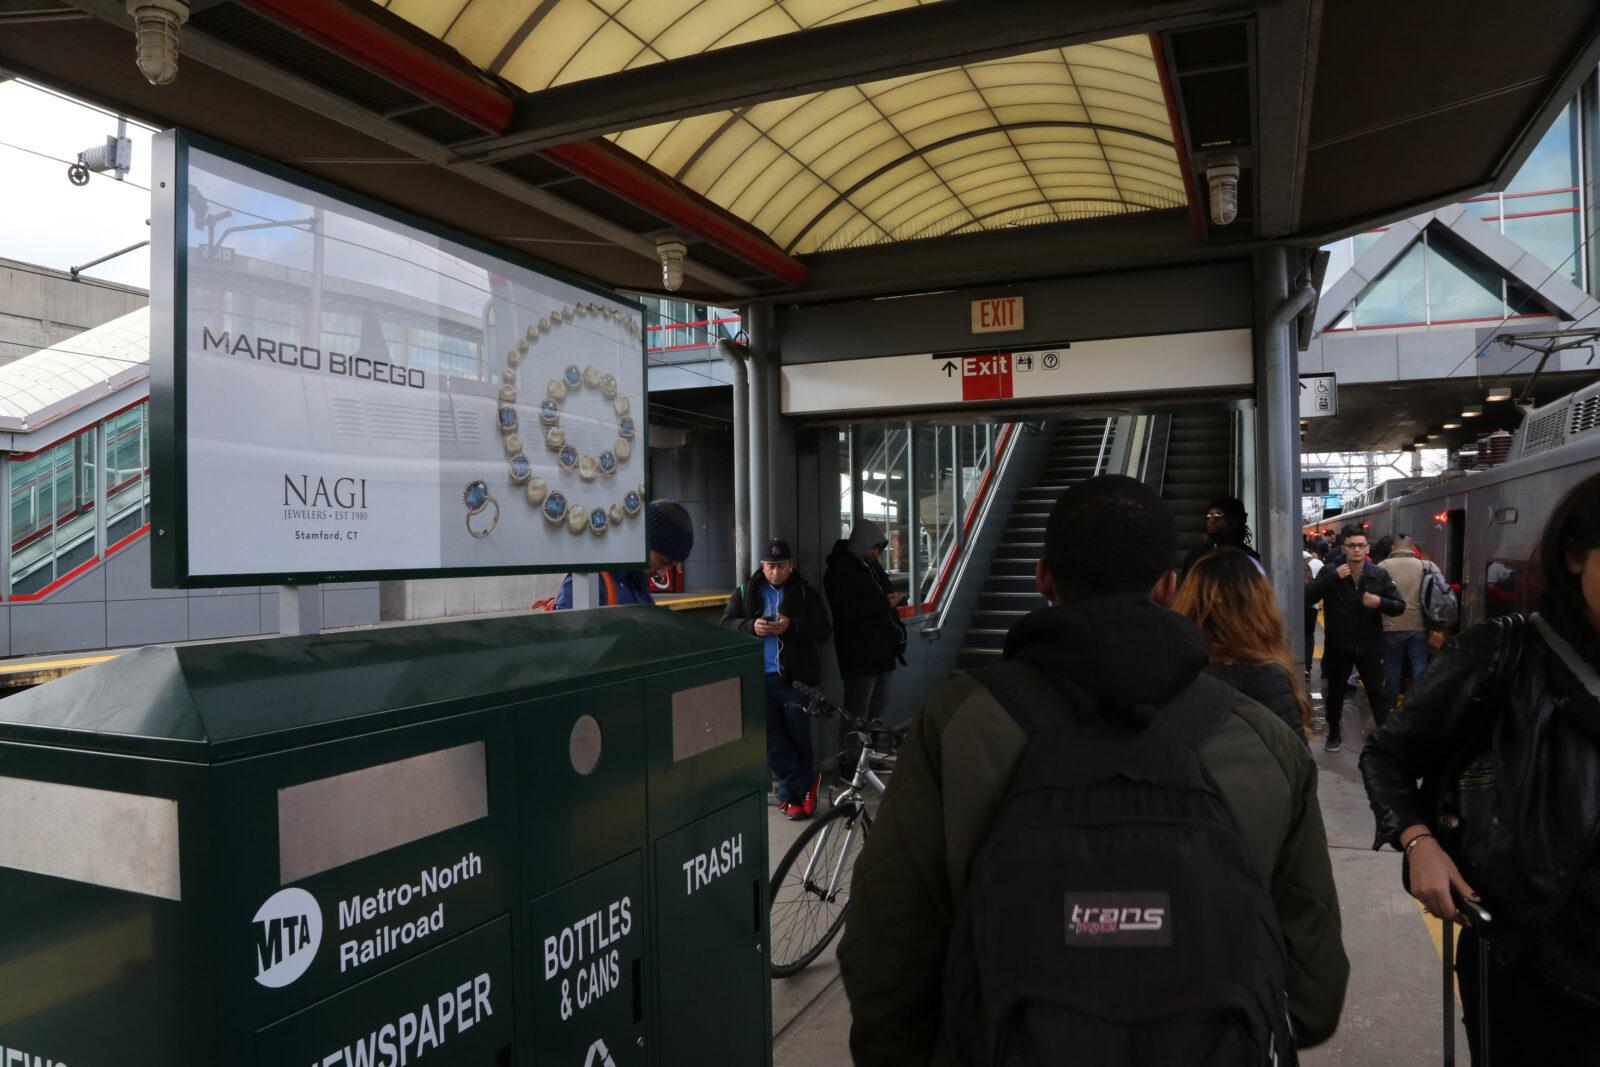 NAGI Jewelers Rail Platform Kiosk Posters Advertising Campaign